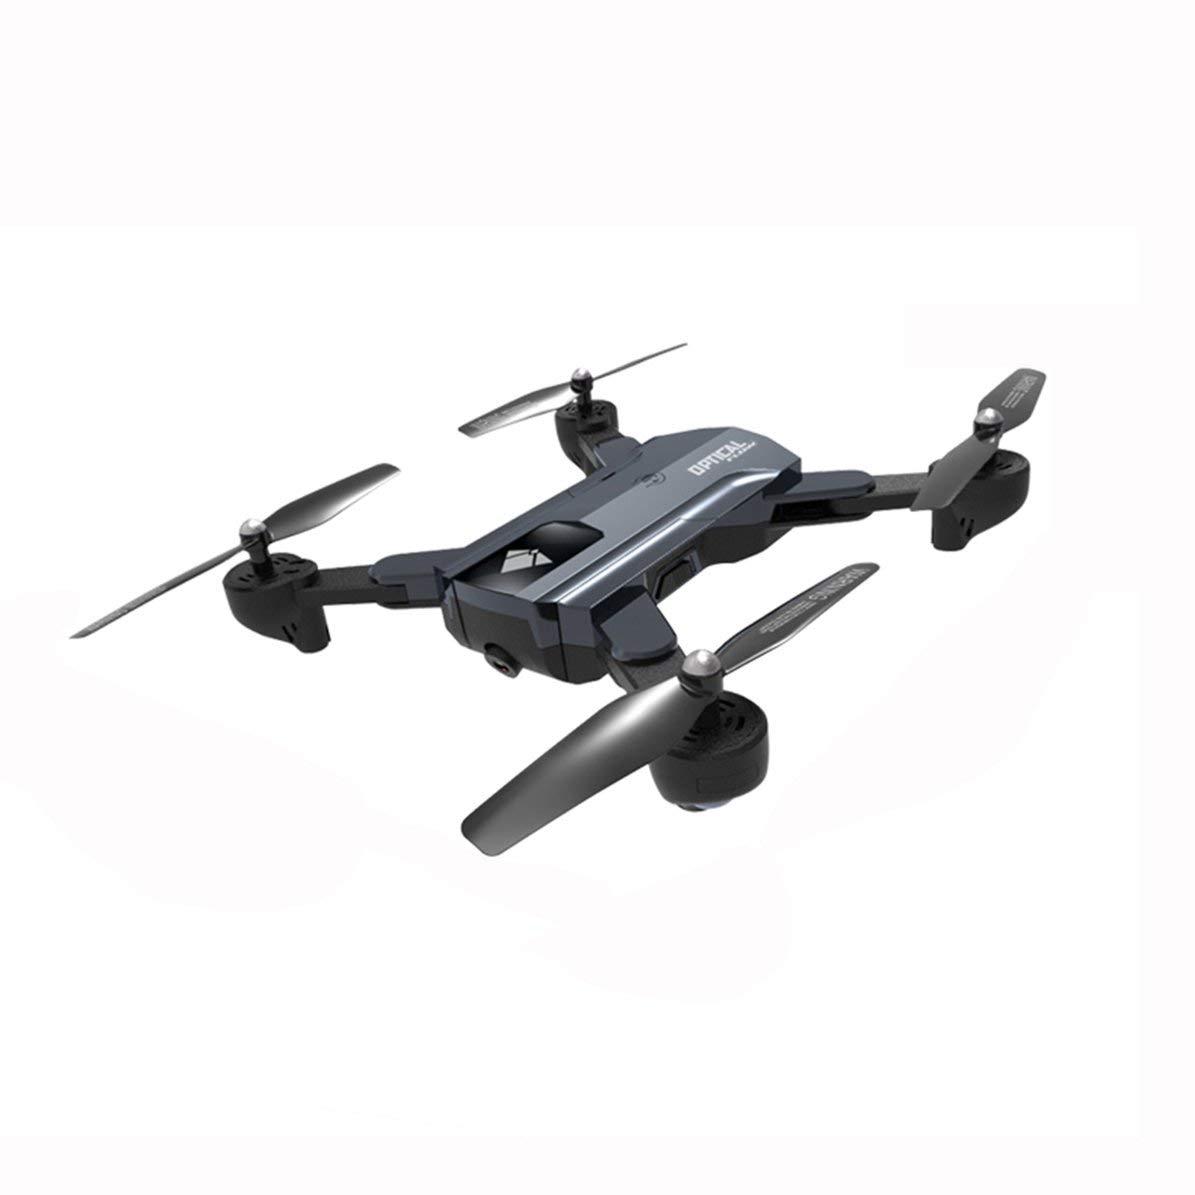 DoMoment F196 Optical Flow Localization Faltbare Quadcopter-Wi-Fi-RC-Drohne mit 2.0MP HD-Kamera 1100mAh-Akku Headless-Modus-Flugzeugen